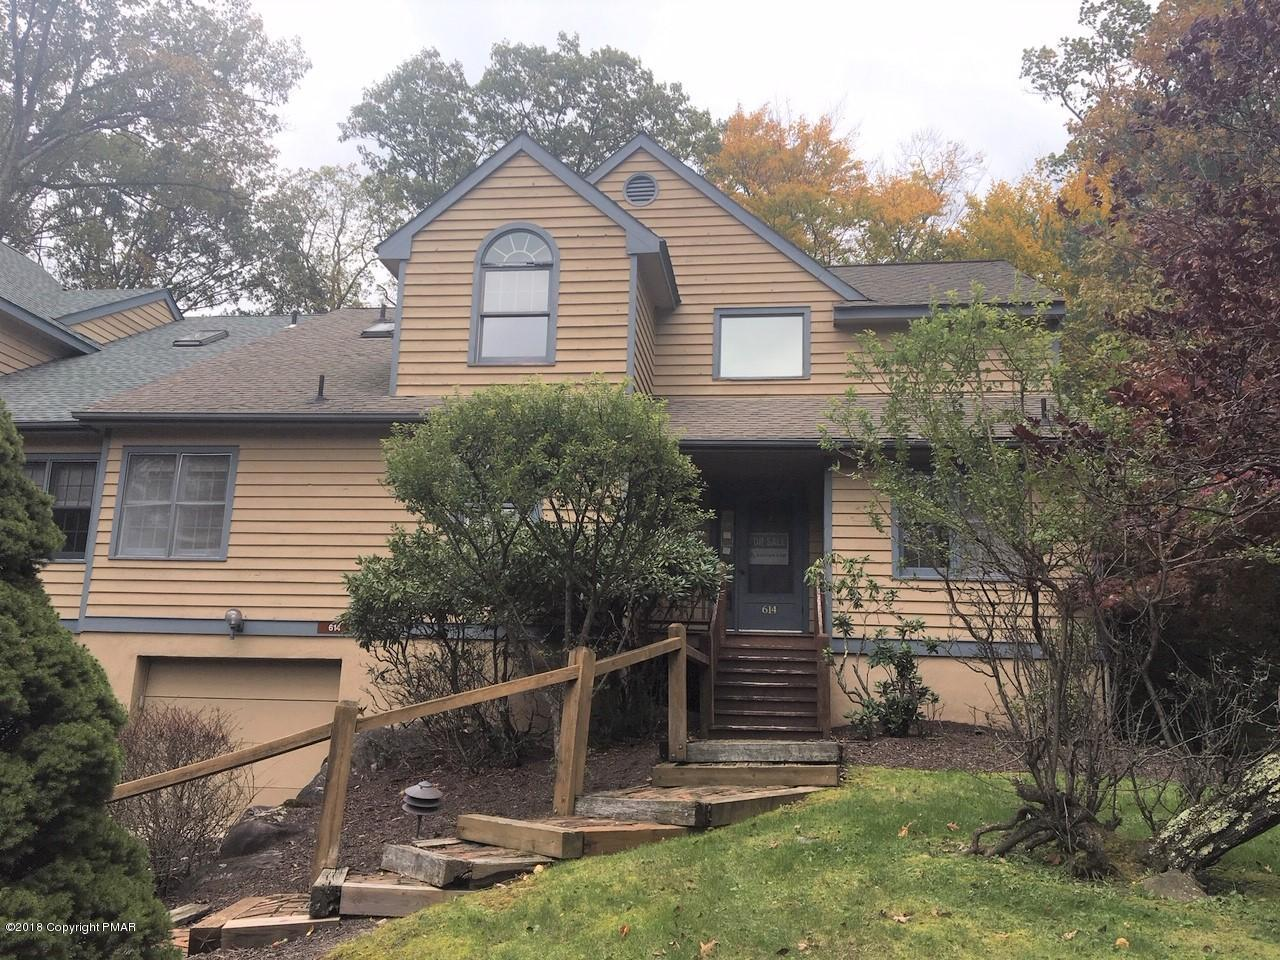 614 Buck Cir, Buck Hill Falls, PA 18323